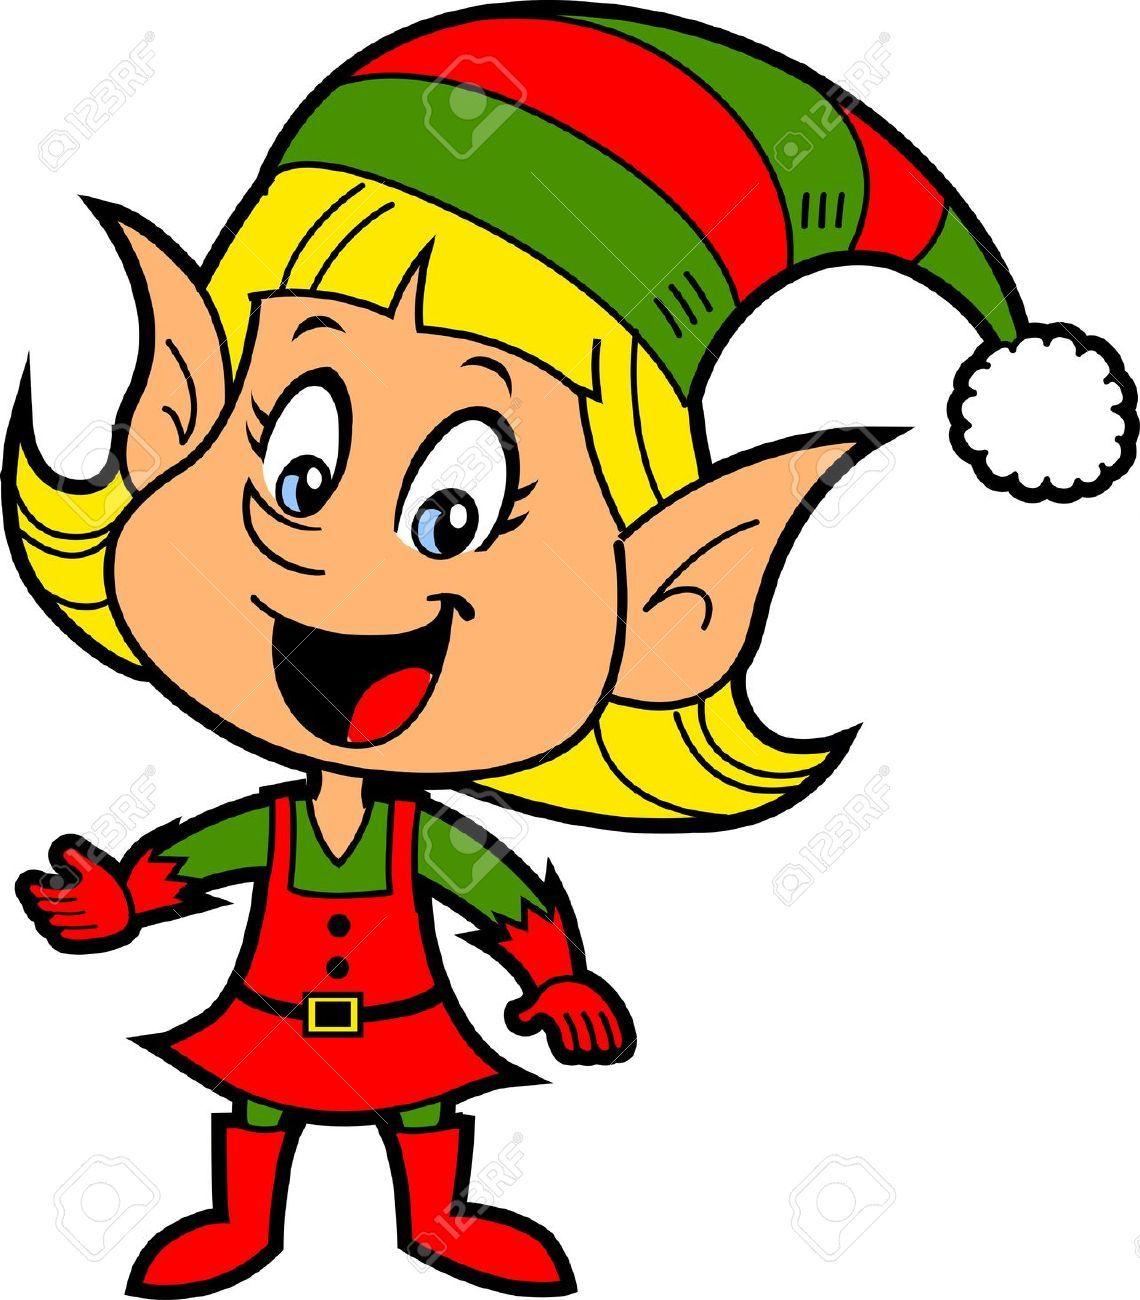 Santas elf stock photos images royalty free